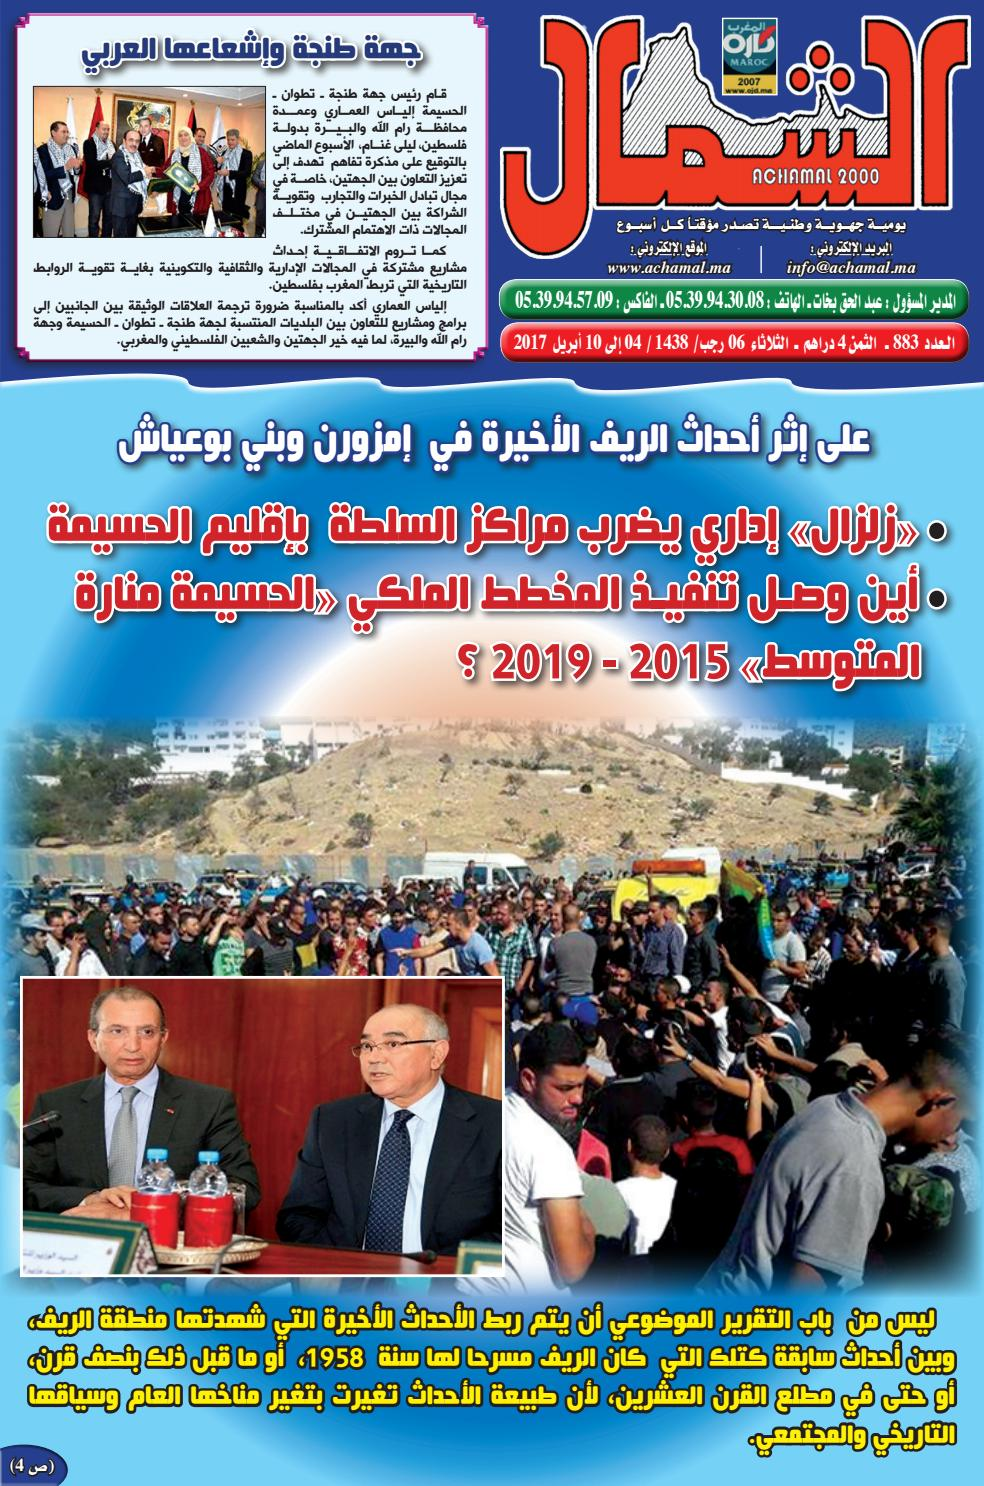 09decc084 Achamal n° 883 le 04 avril 2017 by Journal Achamal - issuu